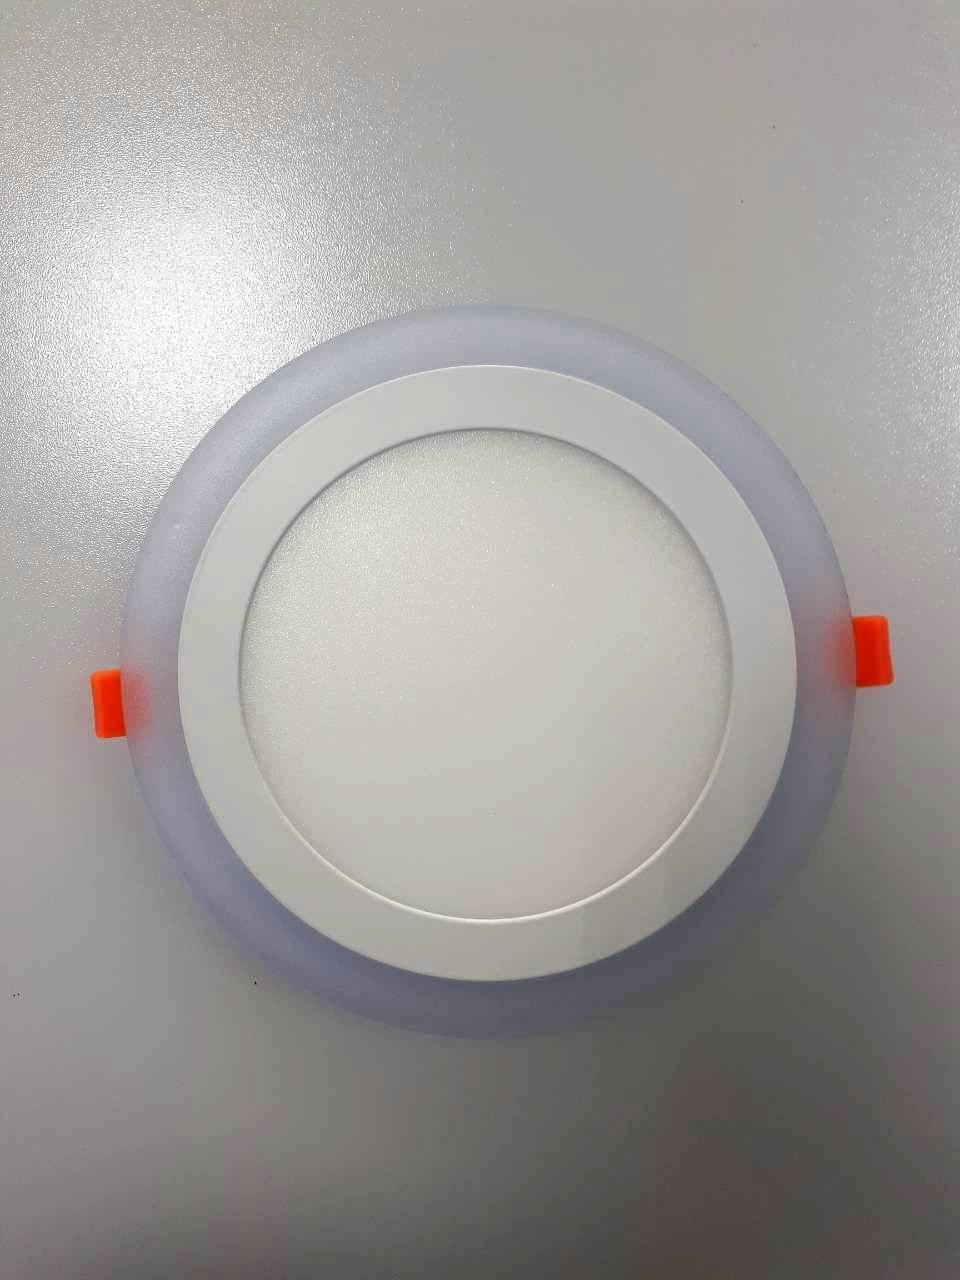 LED панель Lemanso 12+4W с синей подсветкой 4500K круг / LM497